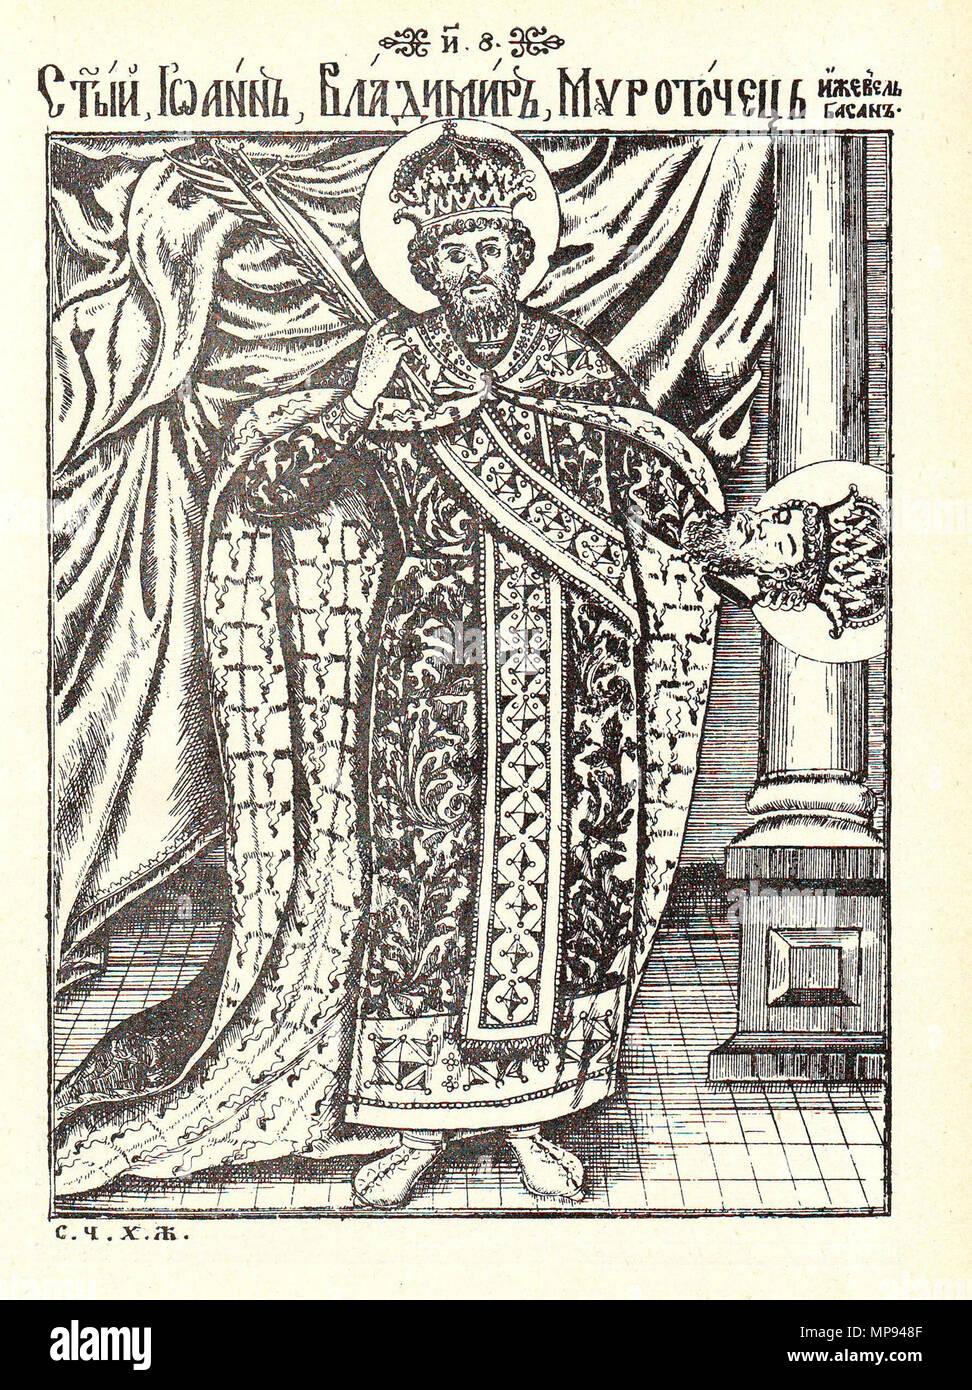 English: Engraving of Saint Jovan Vladimir in Stemmatographia . 1741.  Hristofor Žefarović 1084 Saint Jovan Vladimir (Stemmatographia)